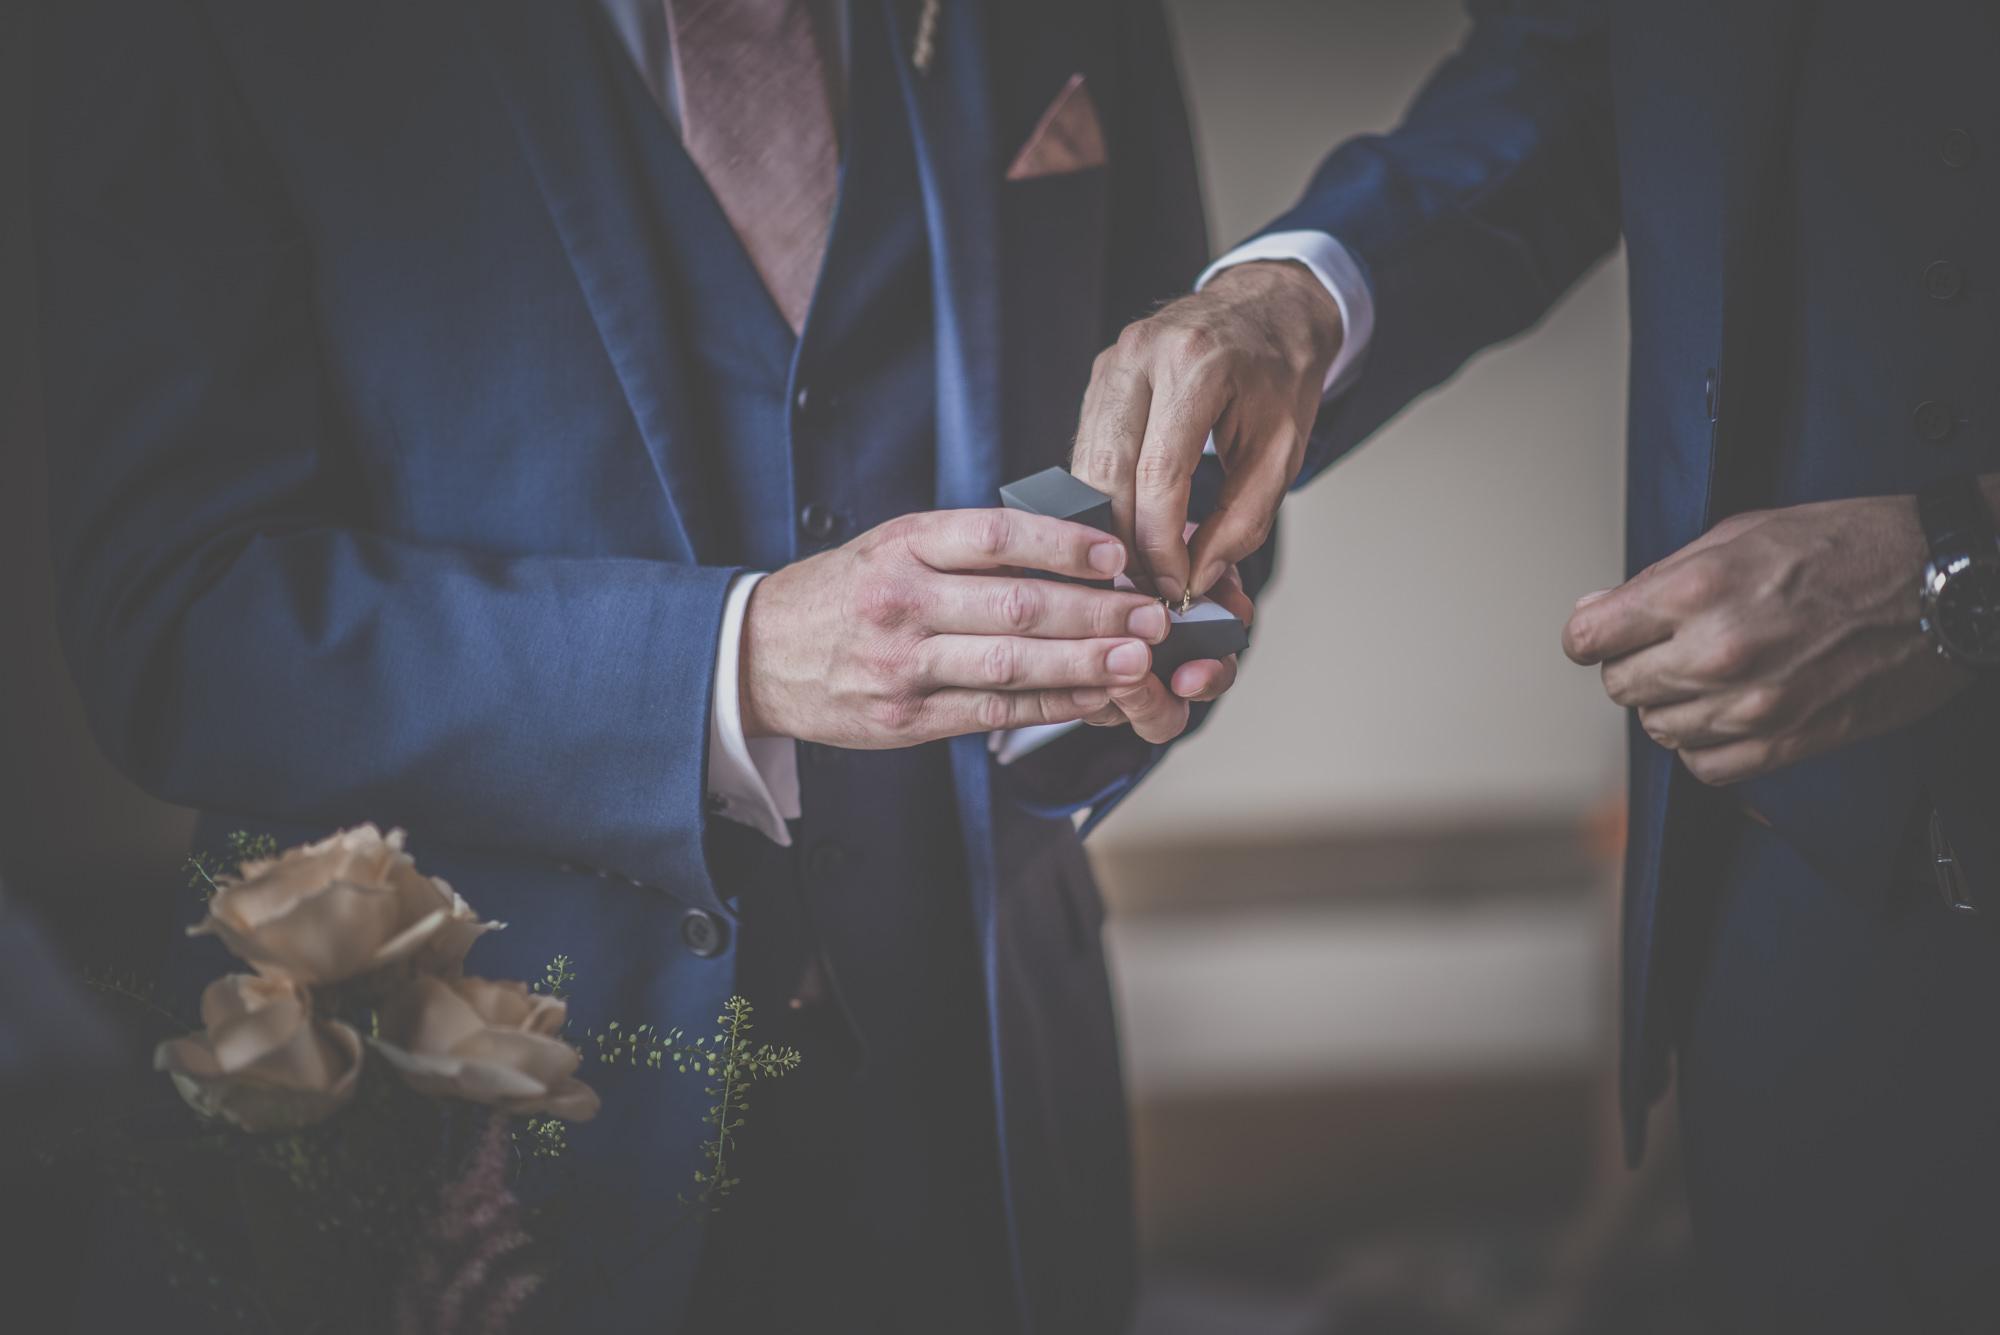 Charisse-and-James-wedding-in-Cain-Manor-Venue-Hampshire-Manu-Mendoza-Wedding-Photography-263.jpg